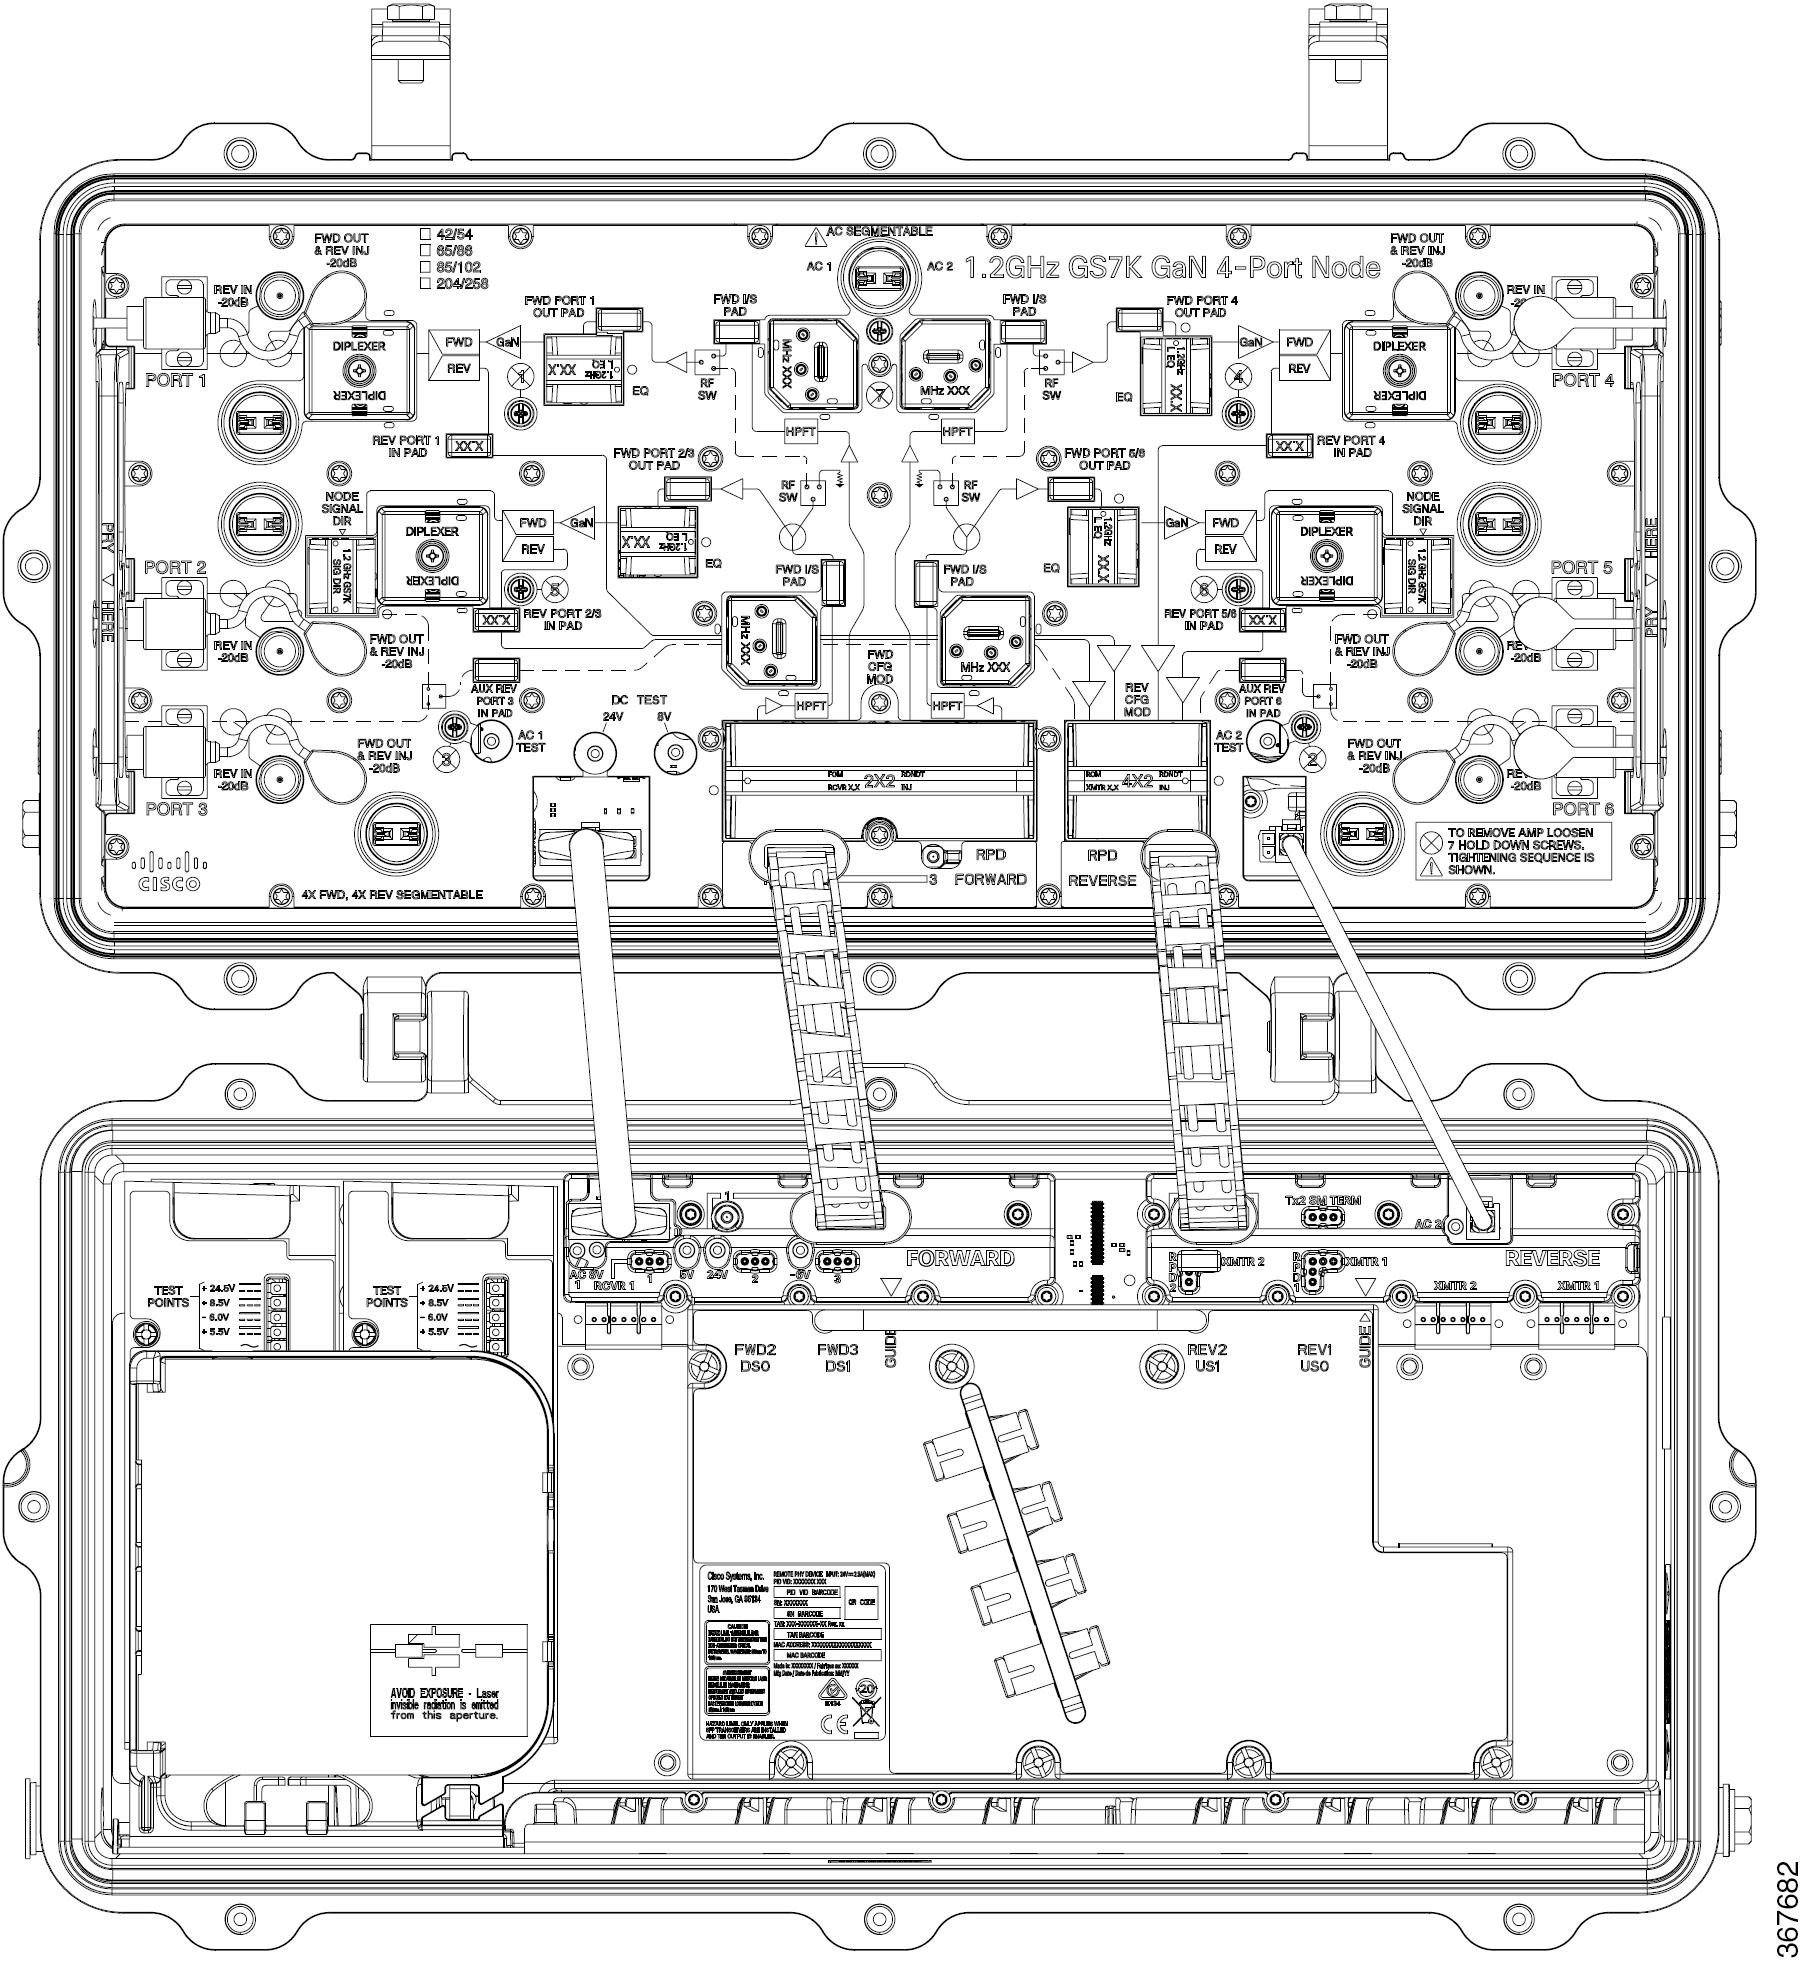 Cisco 12 Ghz Gs7000 Remote Phy Module Compatible 2x2 Segmentable Block Diagram Receiver Locating Hole